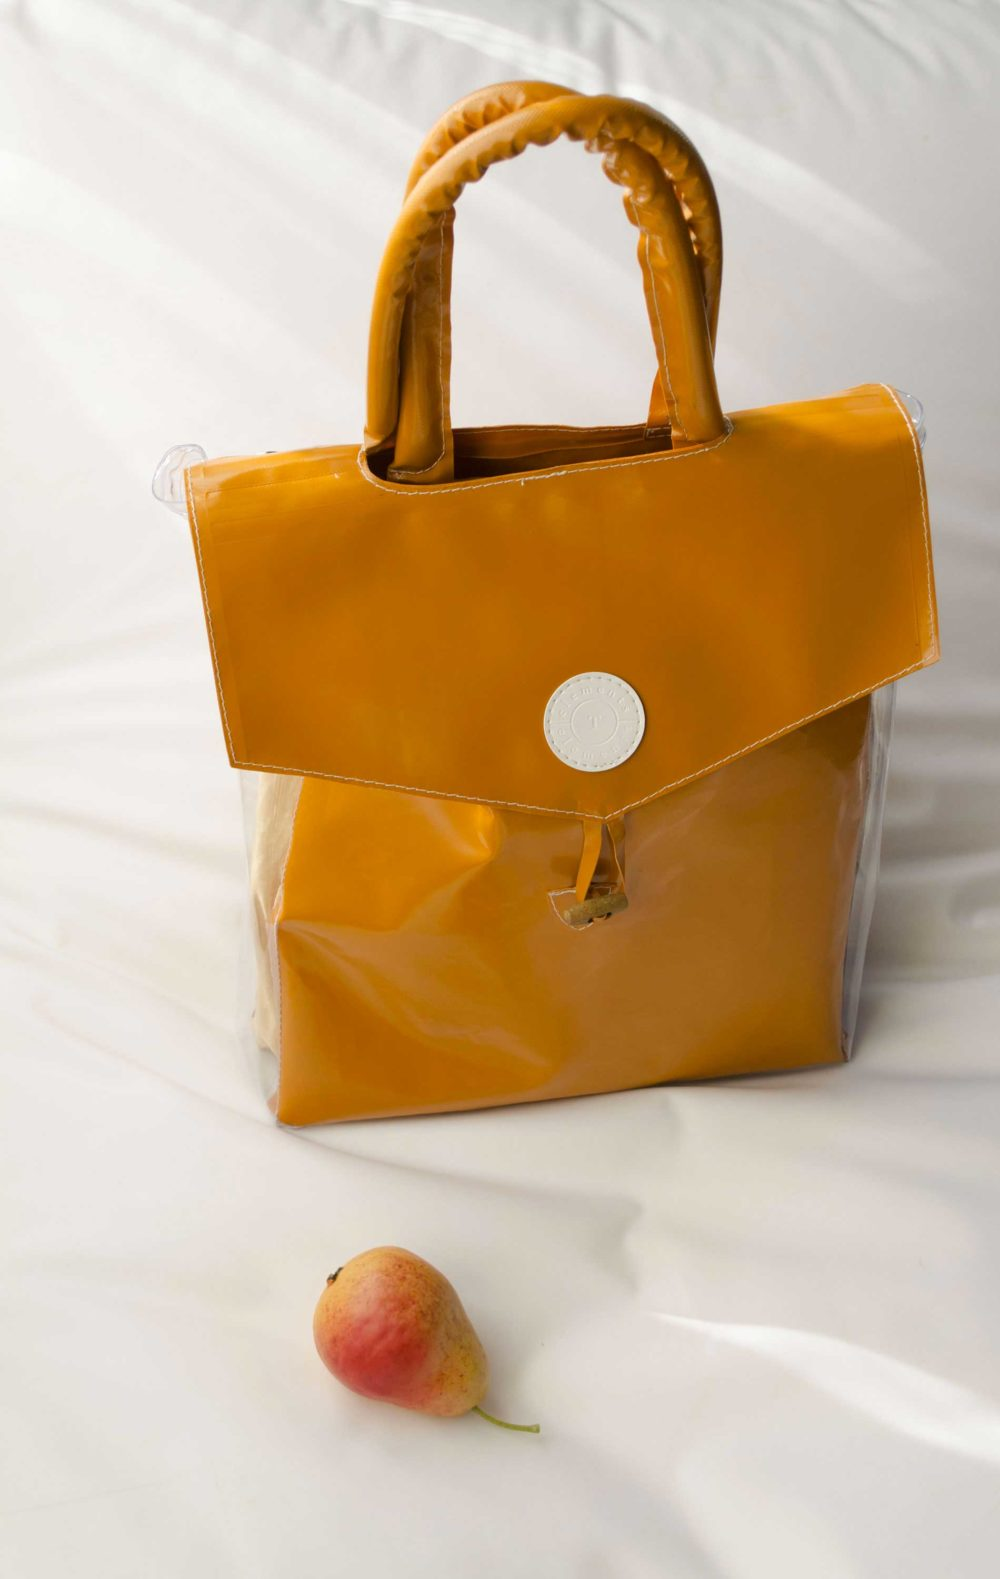 cartella arancione vendita online